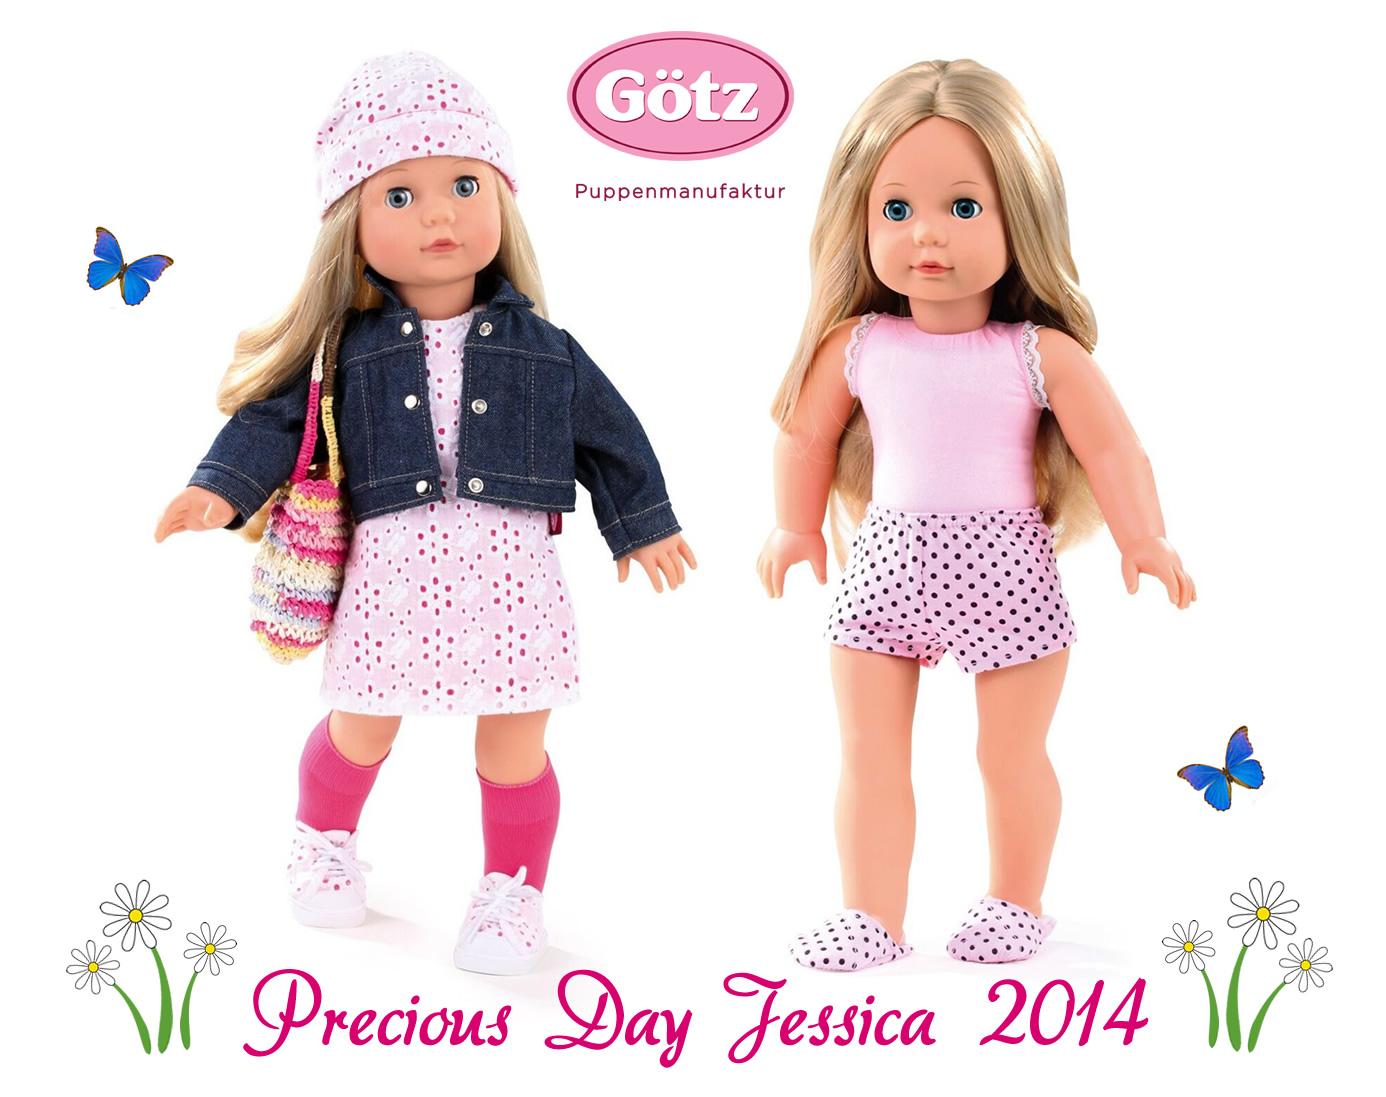 precious day jessica 2014